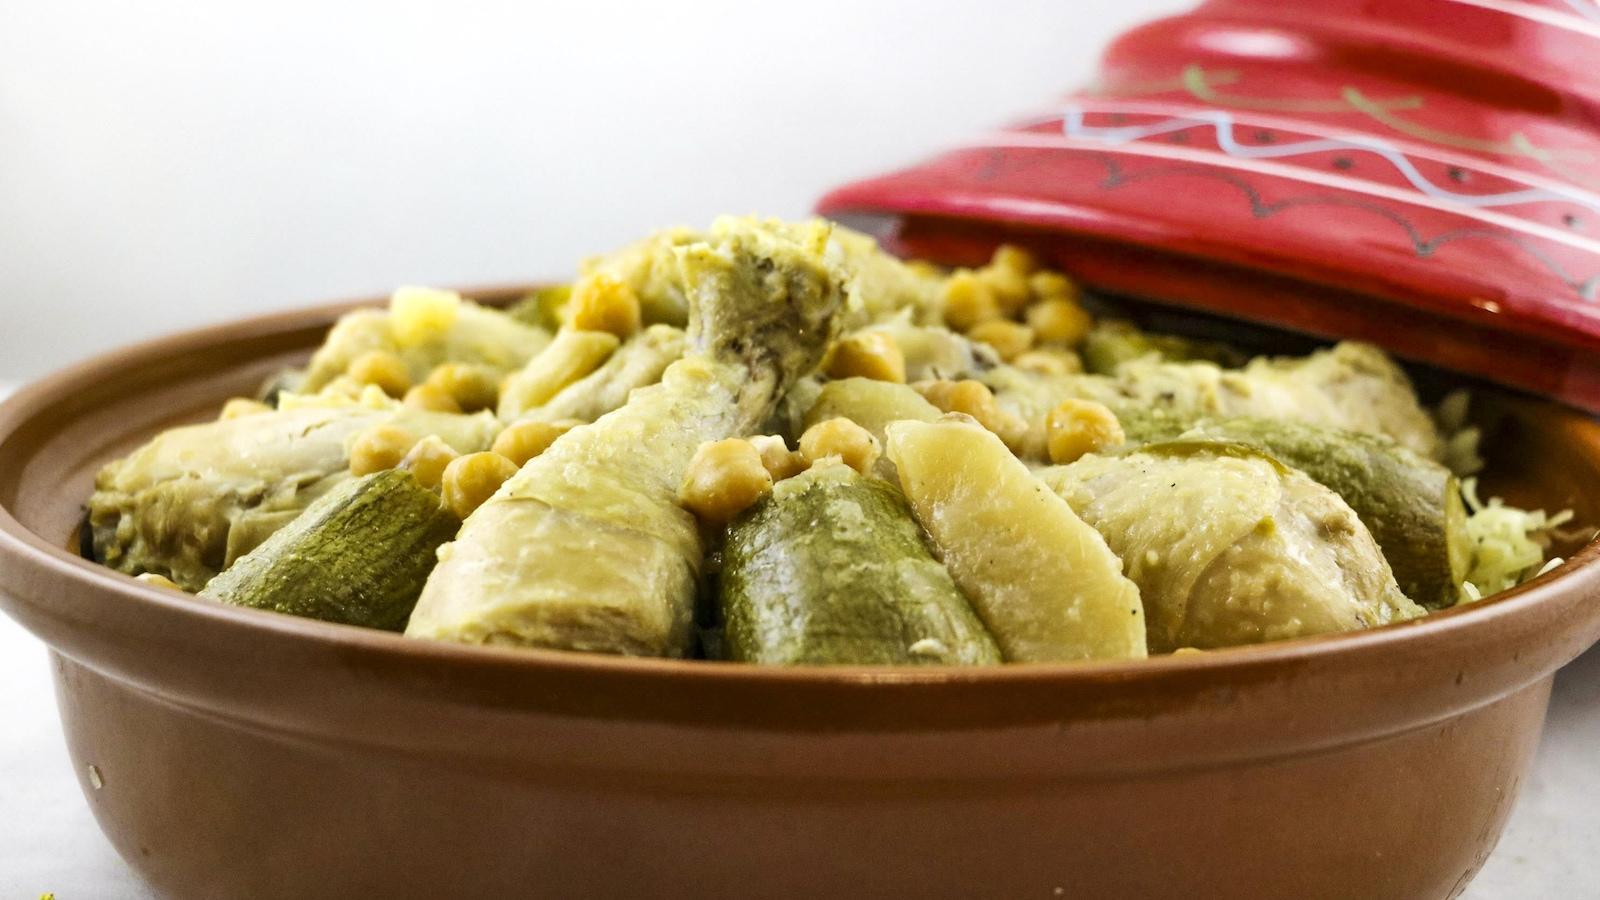 Rechta Algeroise Cuisine Algerienne Marina Orsini Ici Radio